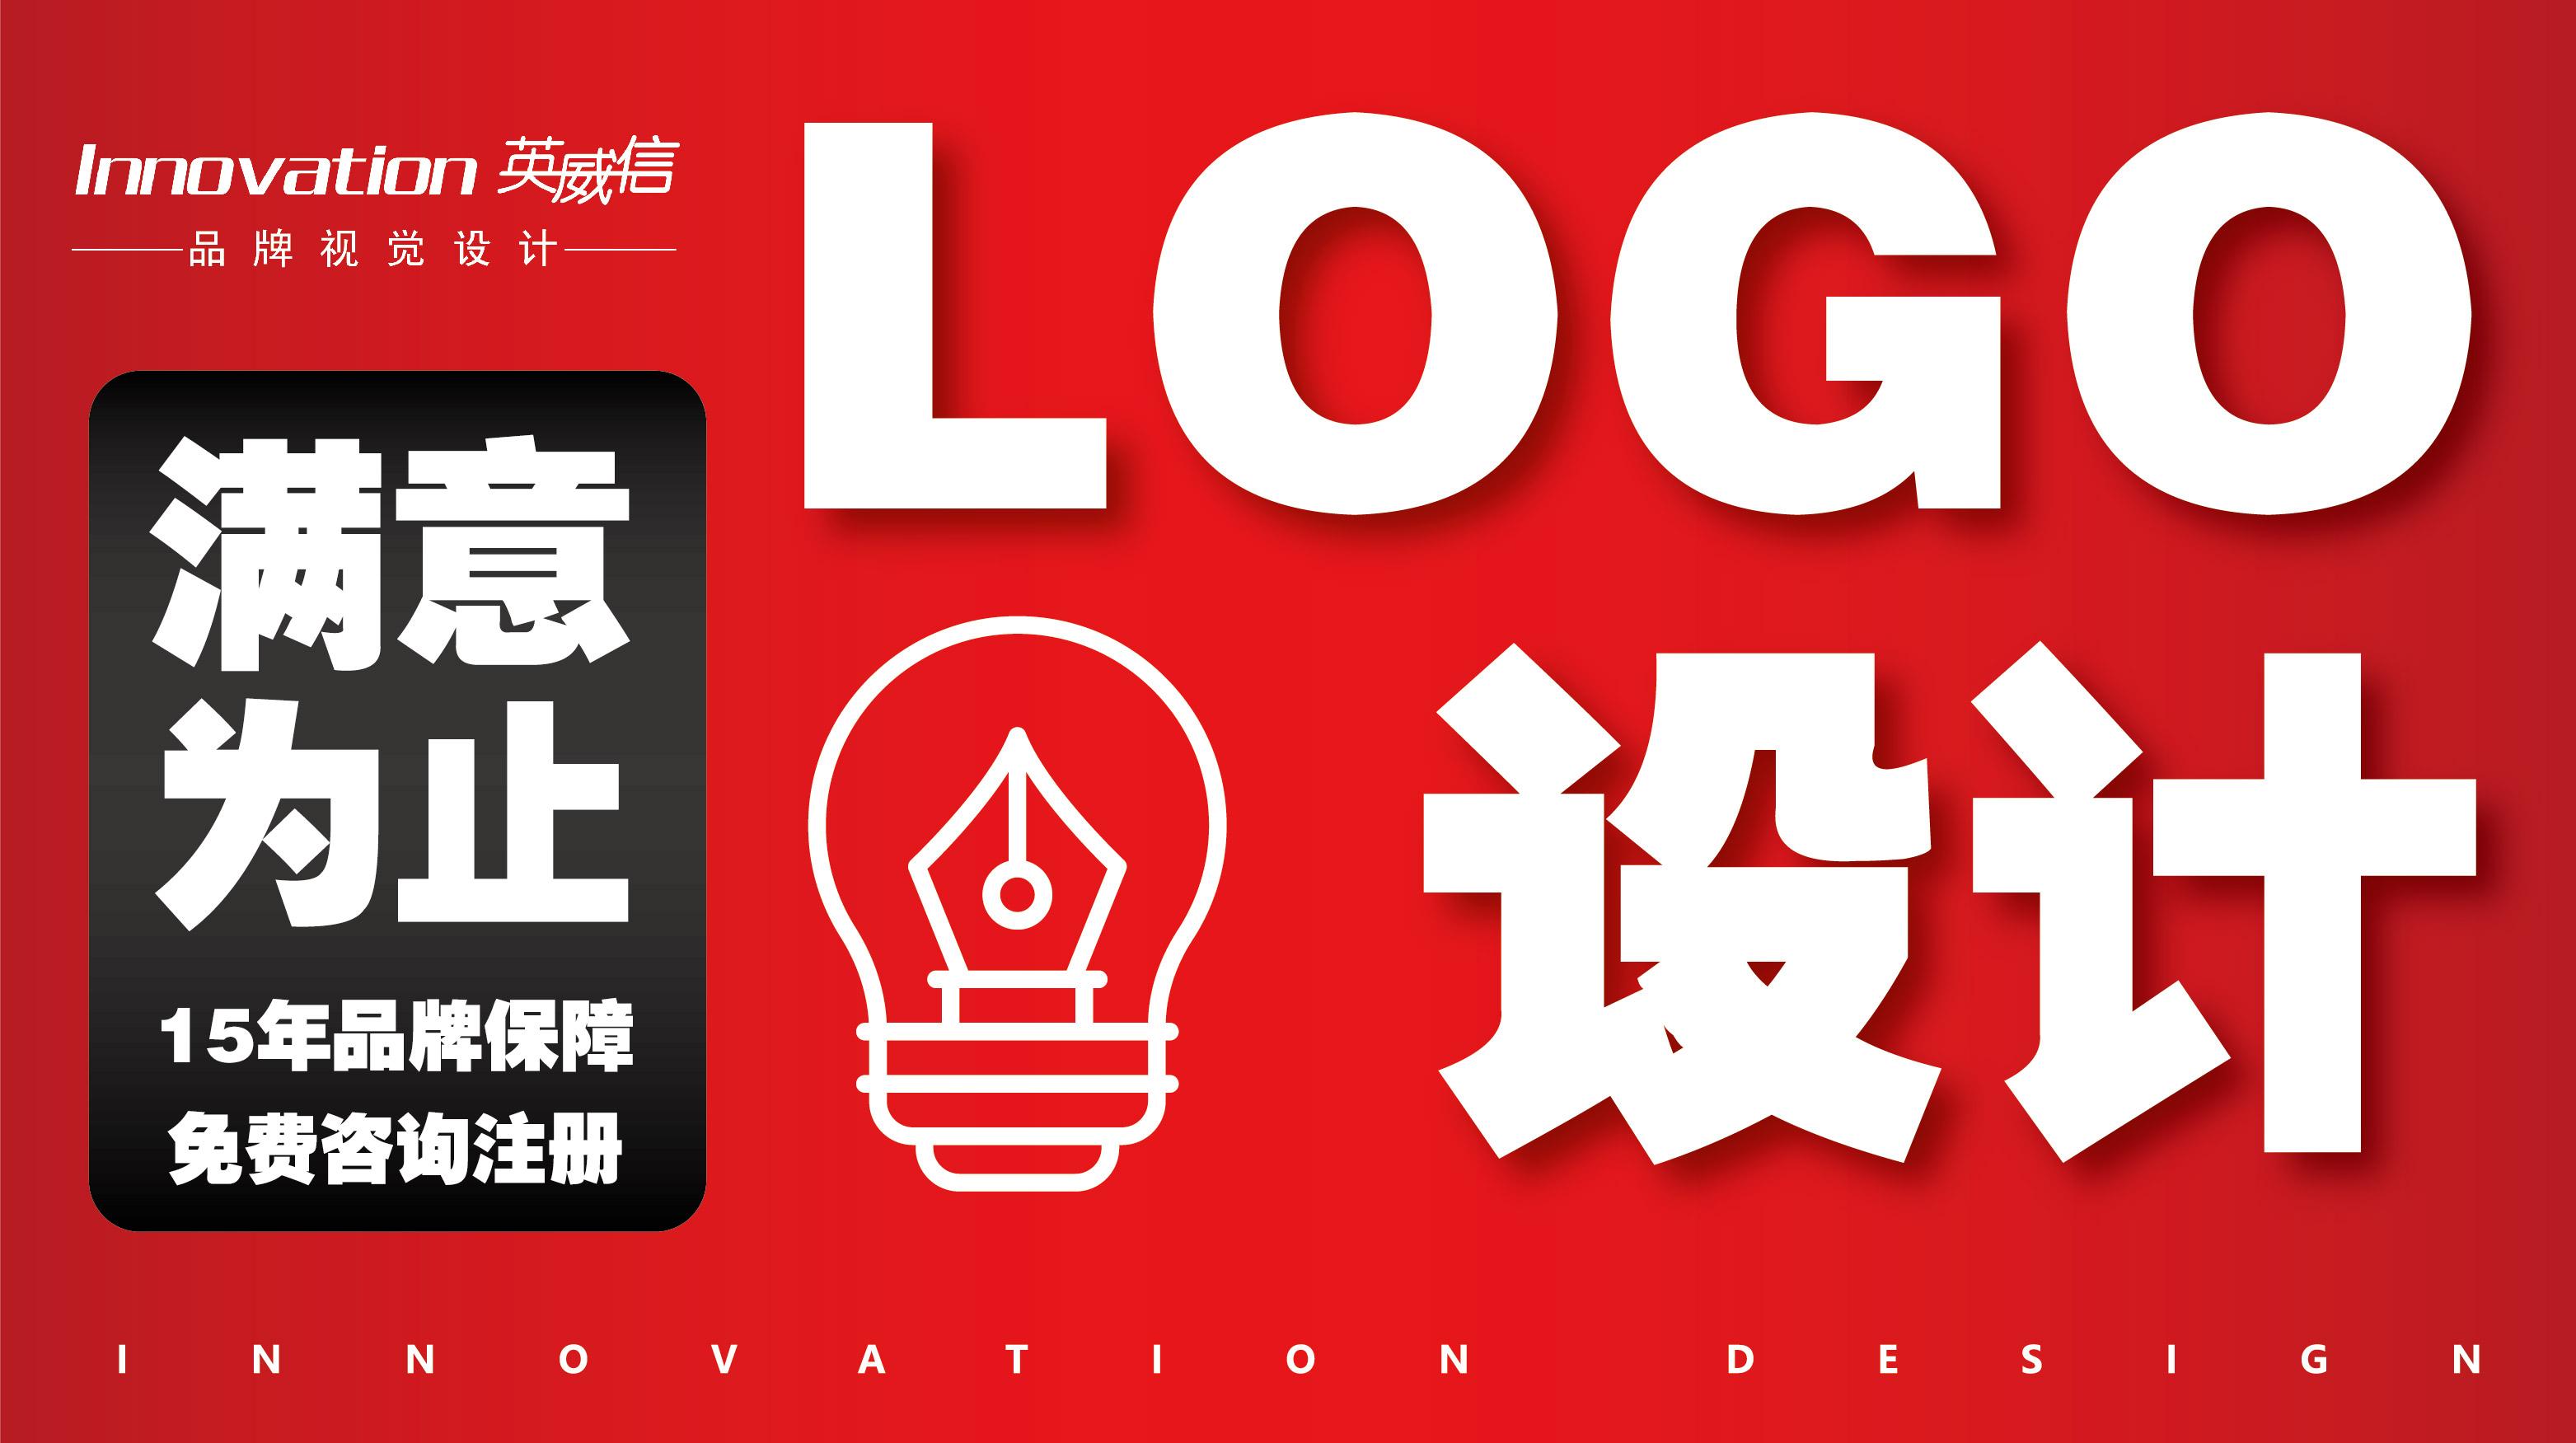 logo设计商标设计公司标志设计平面设计LOGO设计VI设计